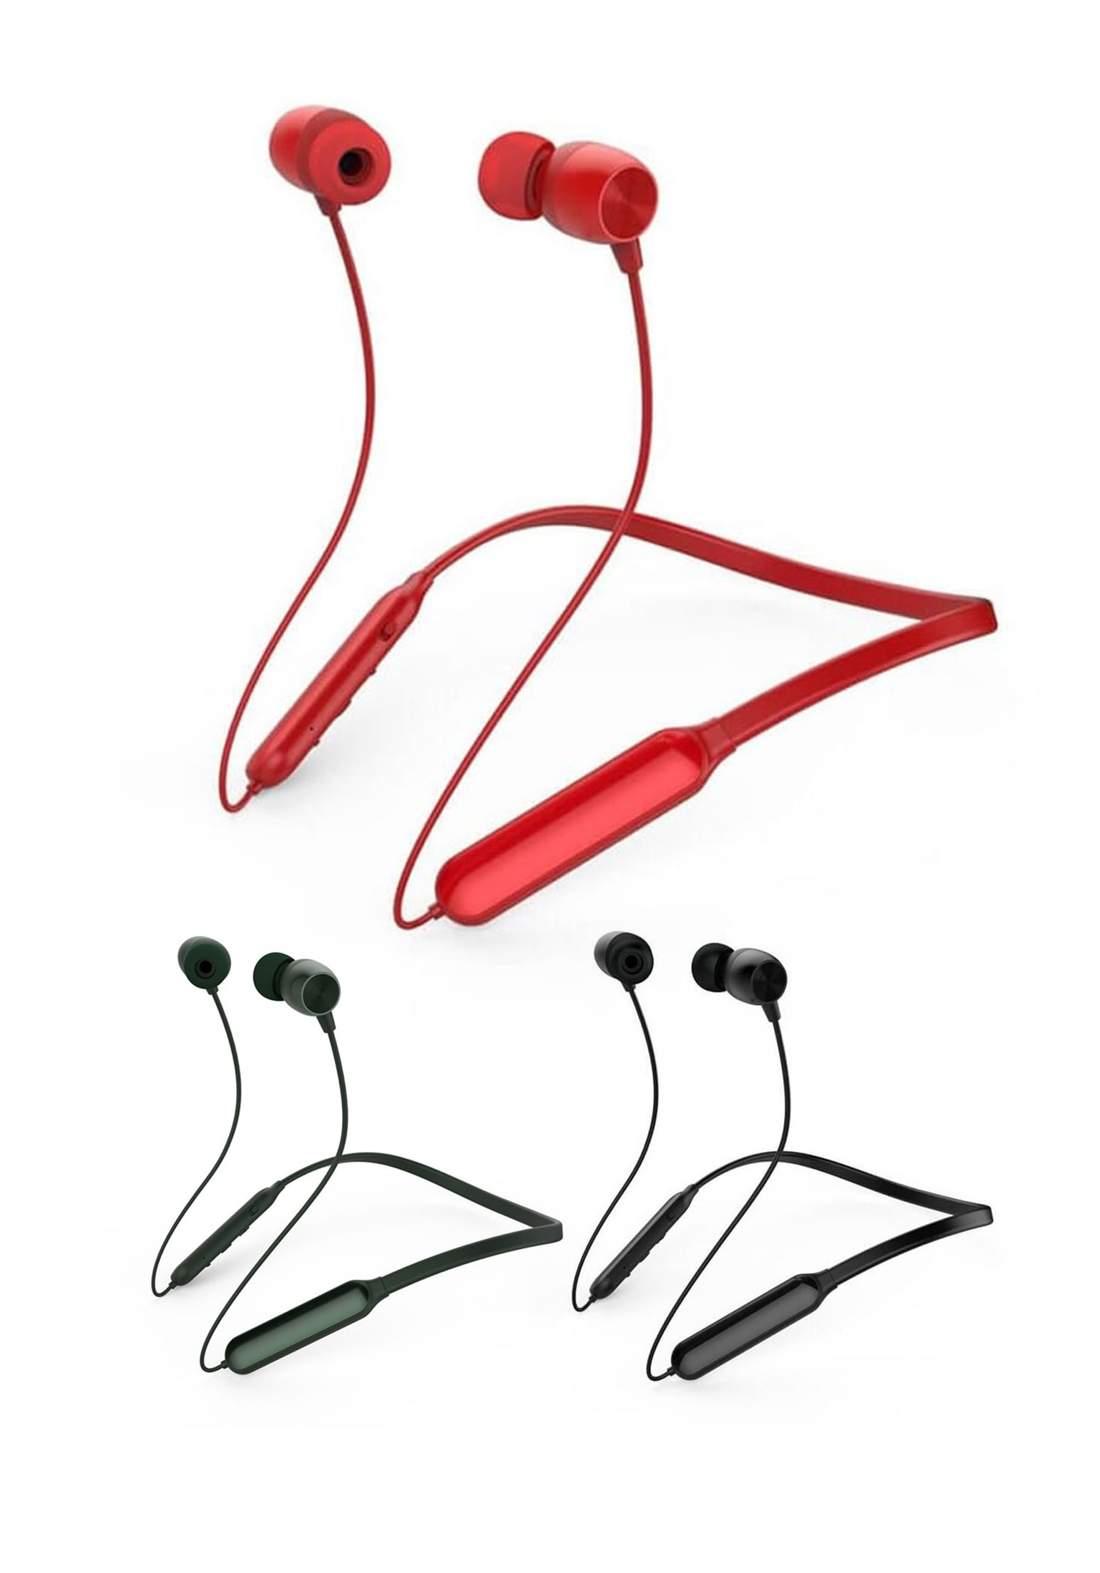 Remax S17 Neck Sports Bluetooth Headset سماعة لا سلكية